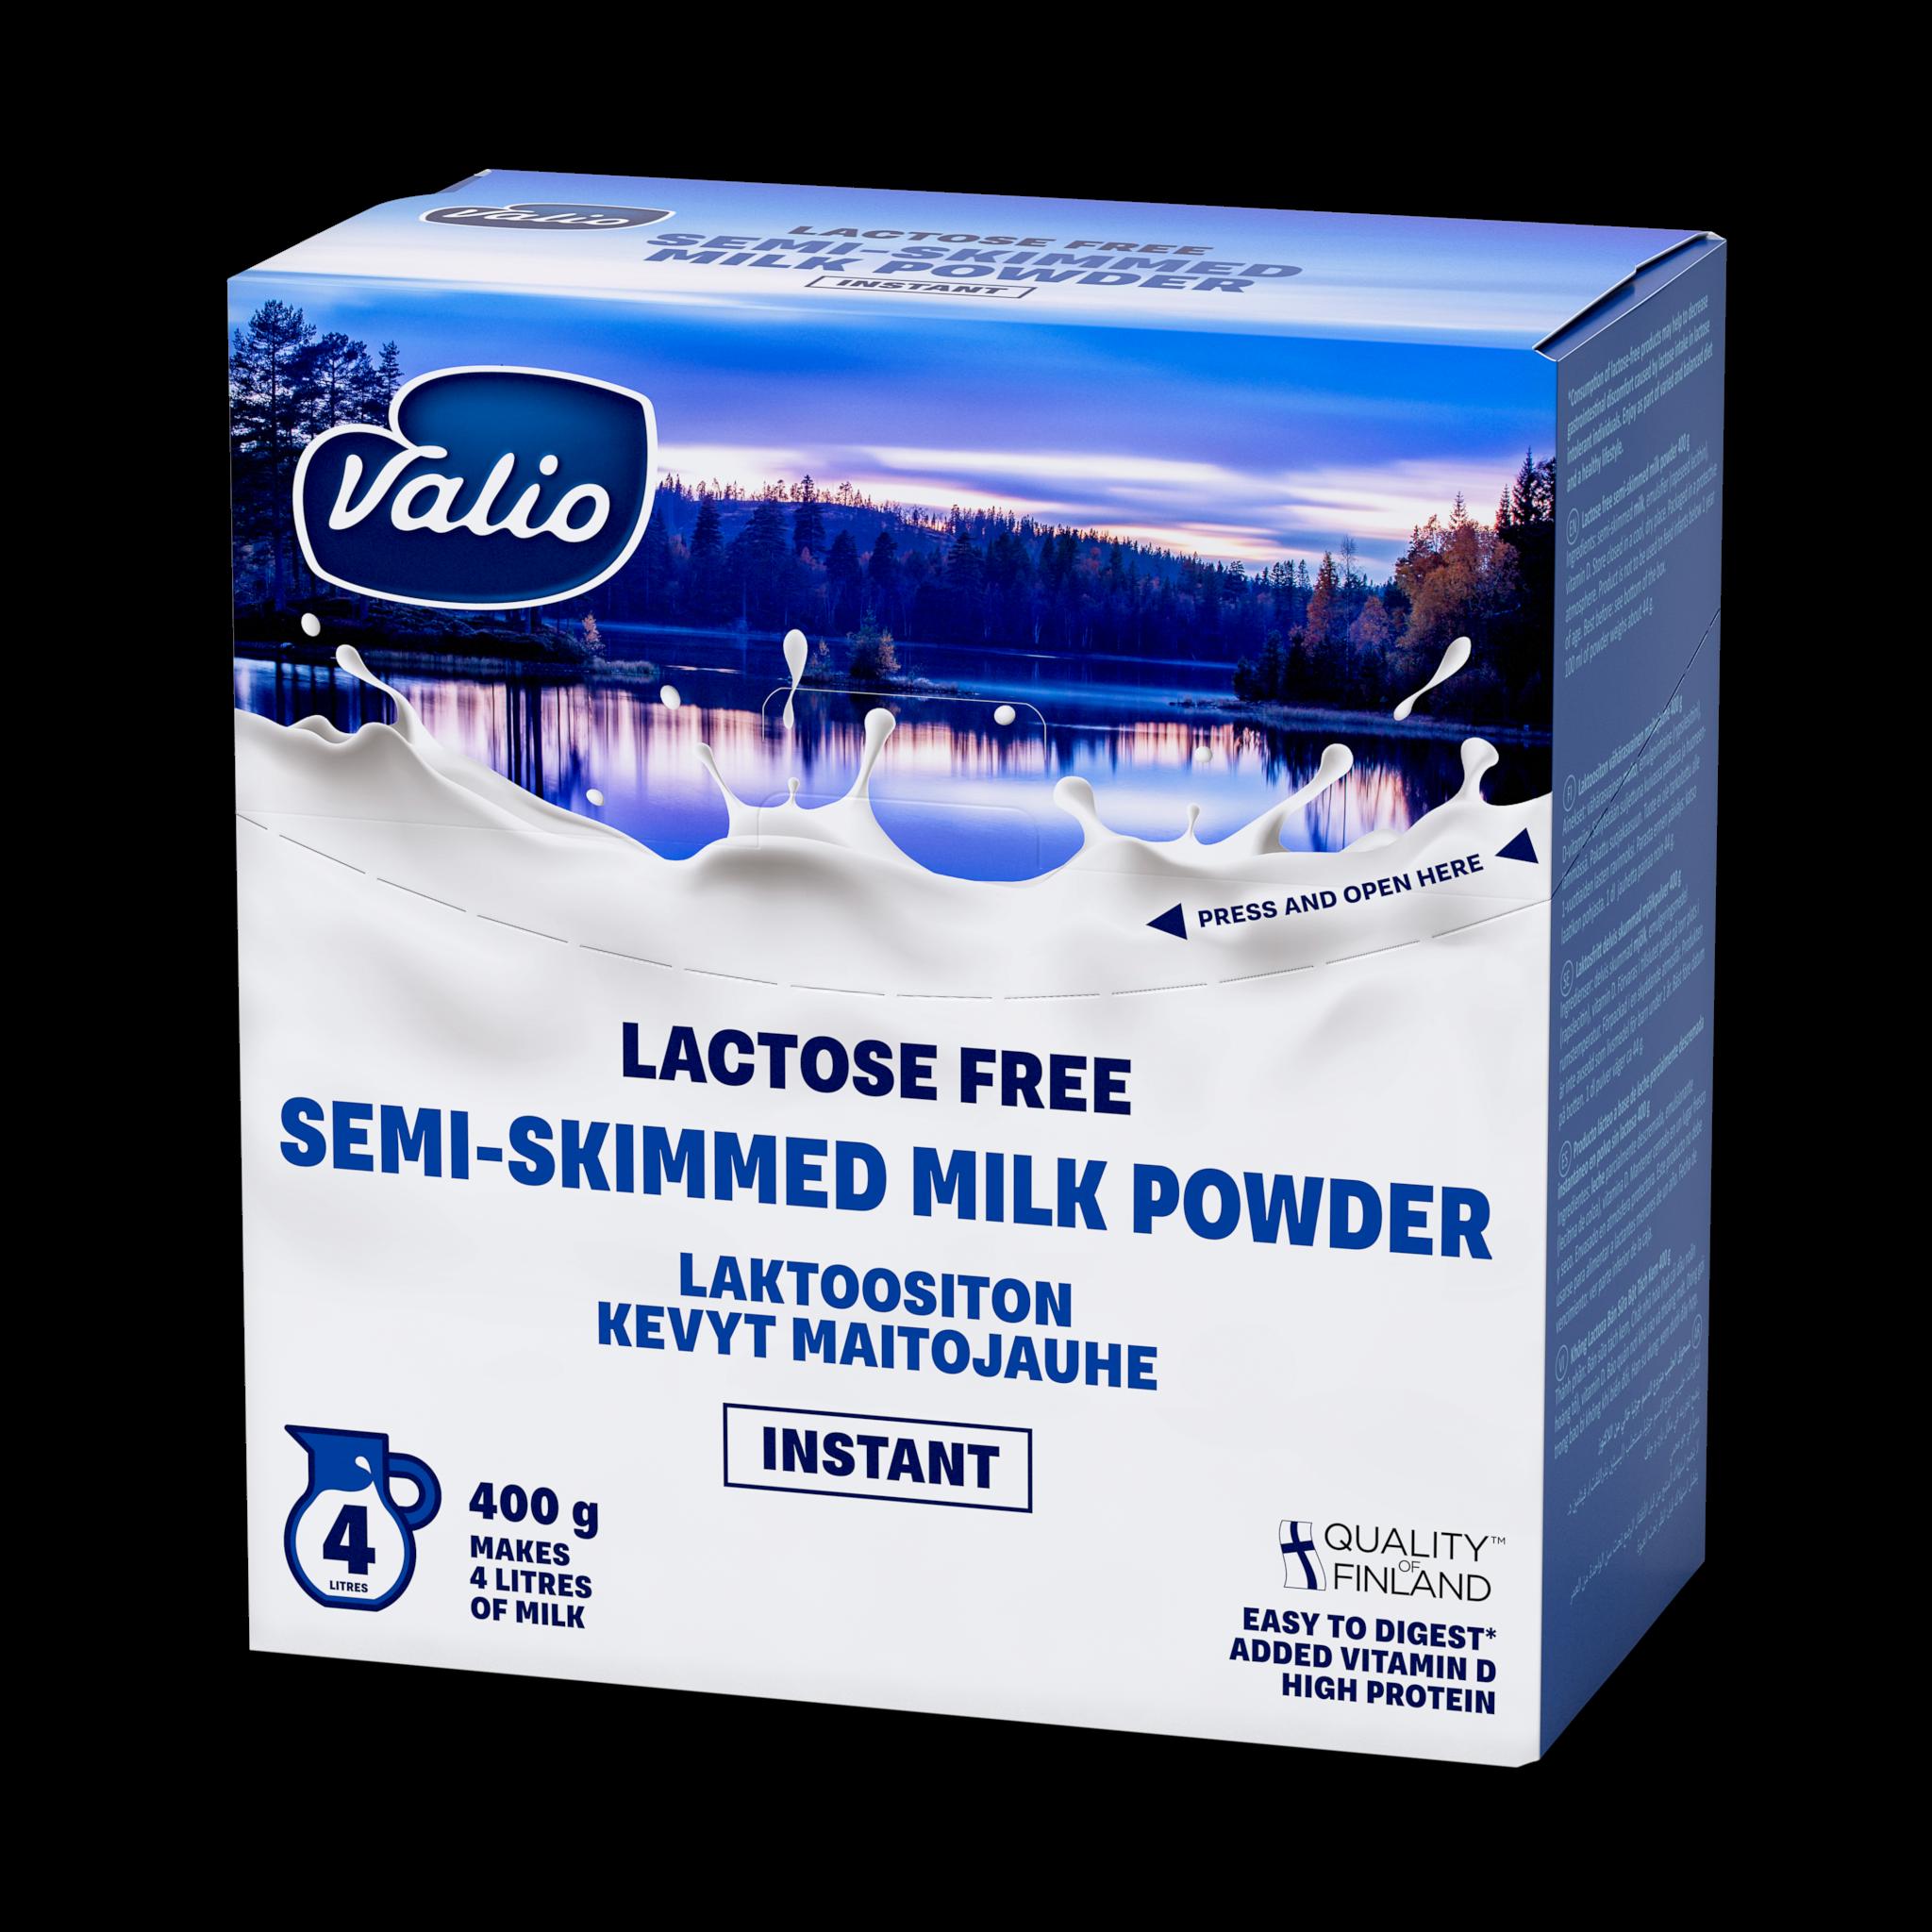 Valio laktoositon kevyt maitojauhe instant